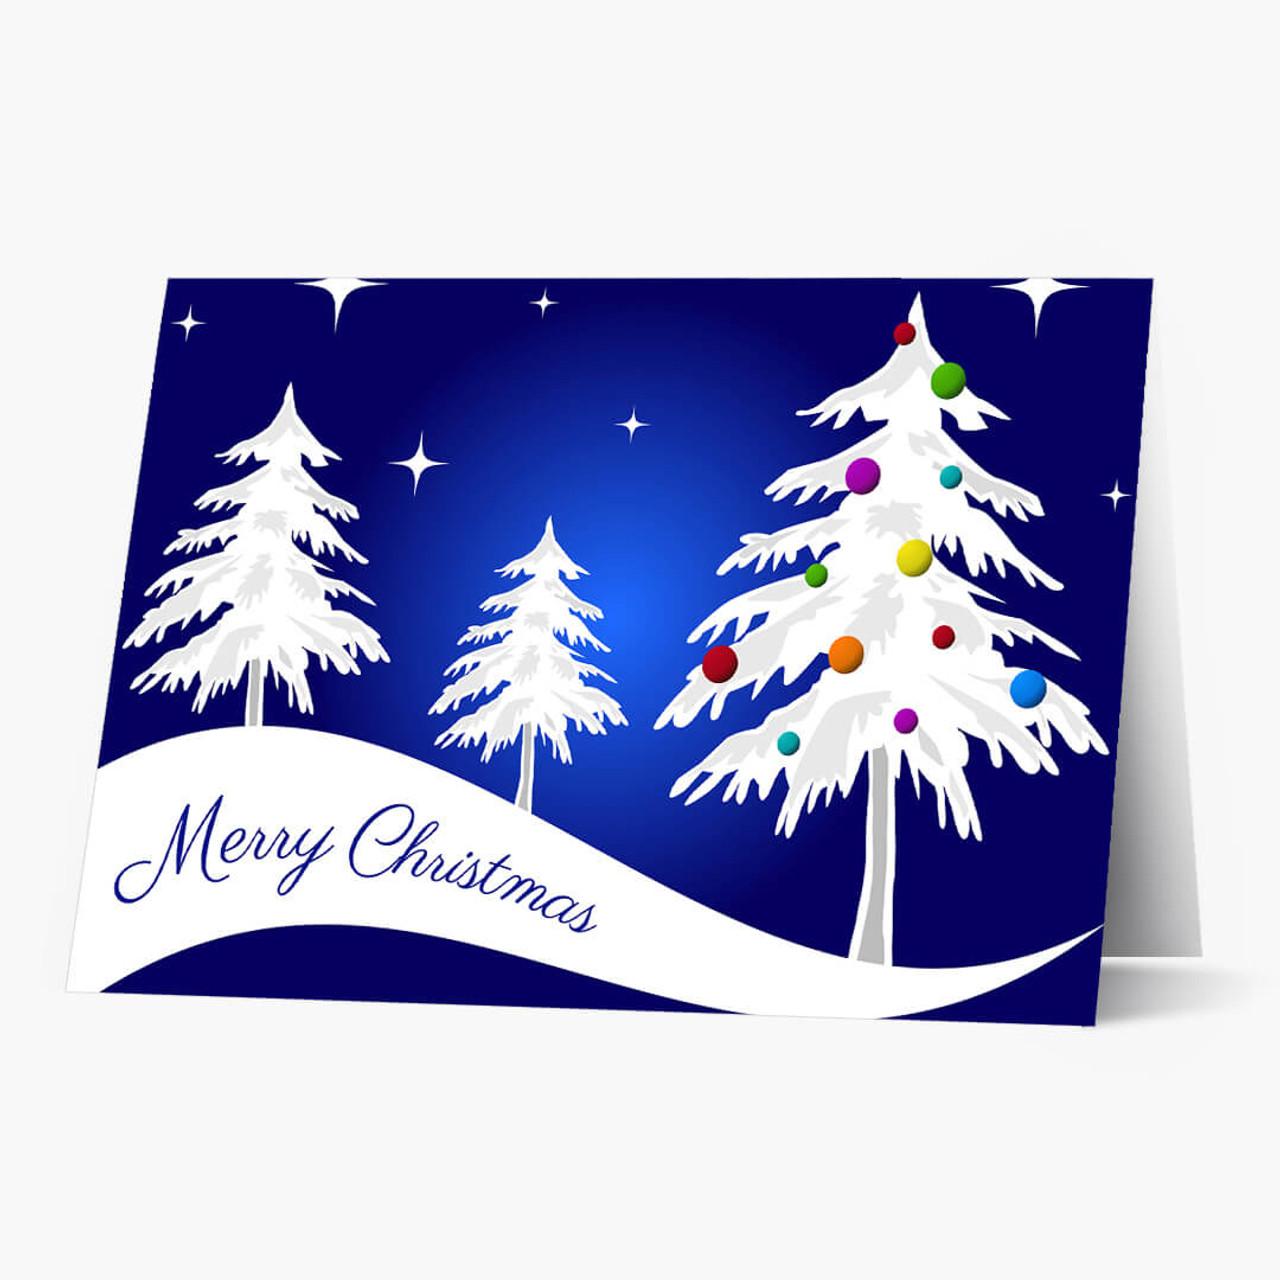 Evening Beauty Christmas Card